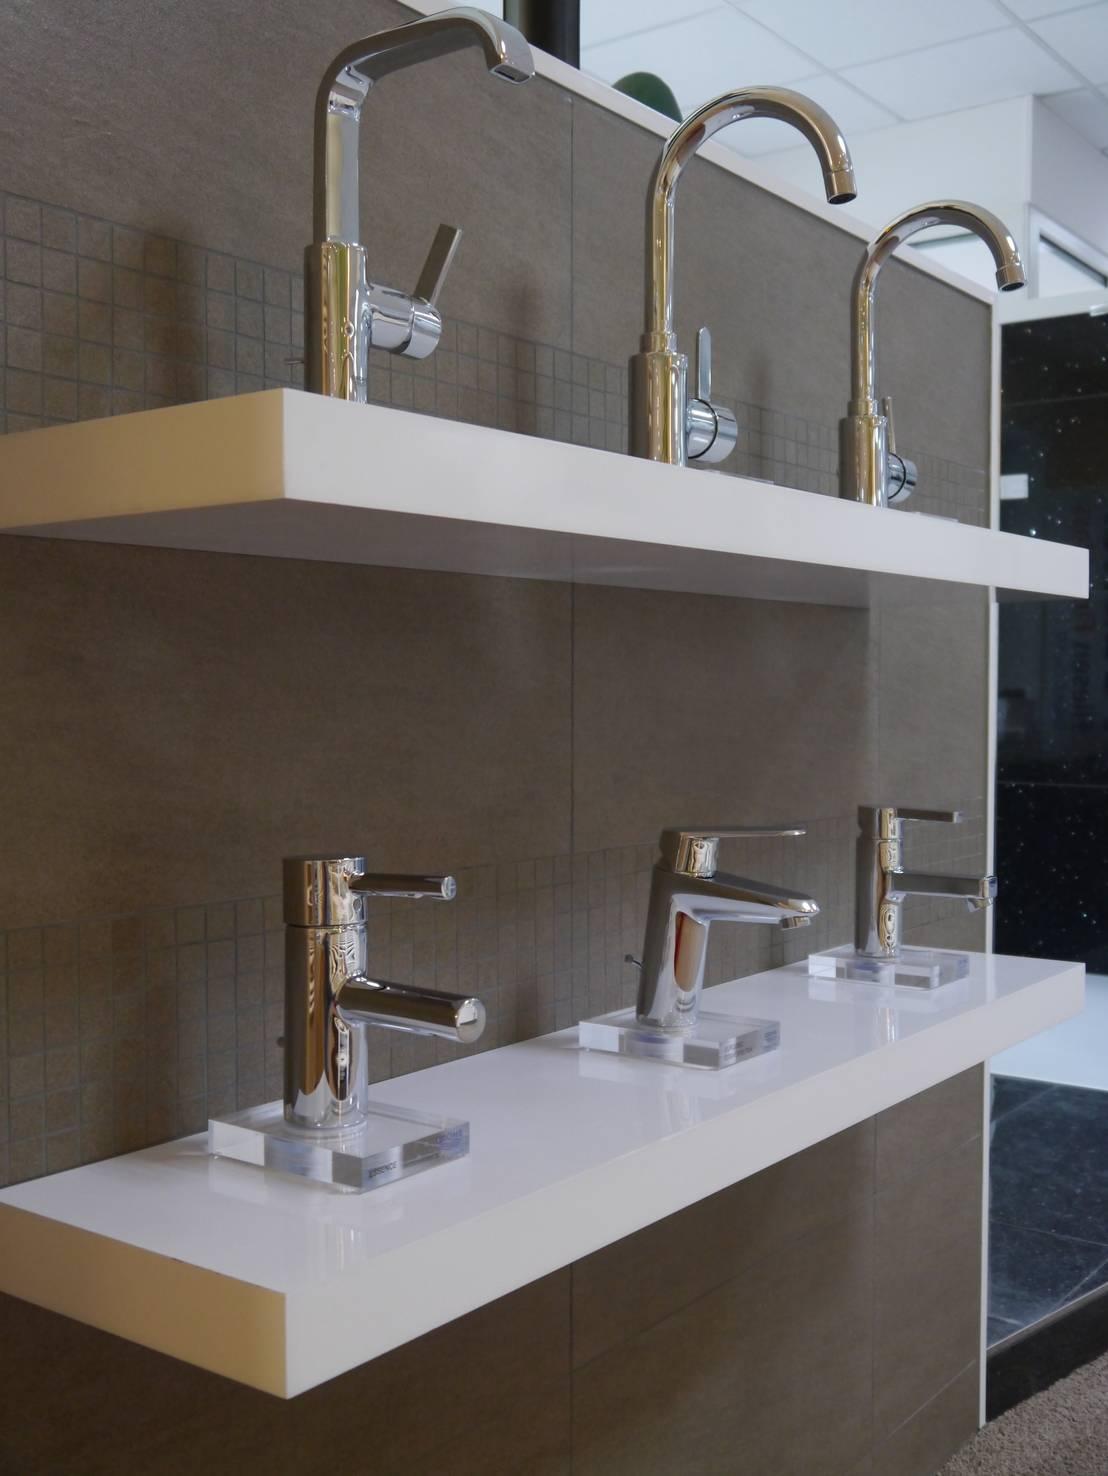 sascha kregeler badezimmer mehr ausstellung homify. Black Bedroom Furniture Sets. Home Design Ideas